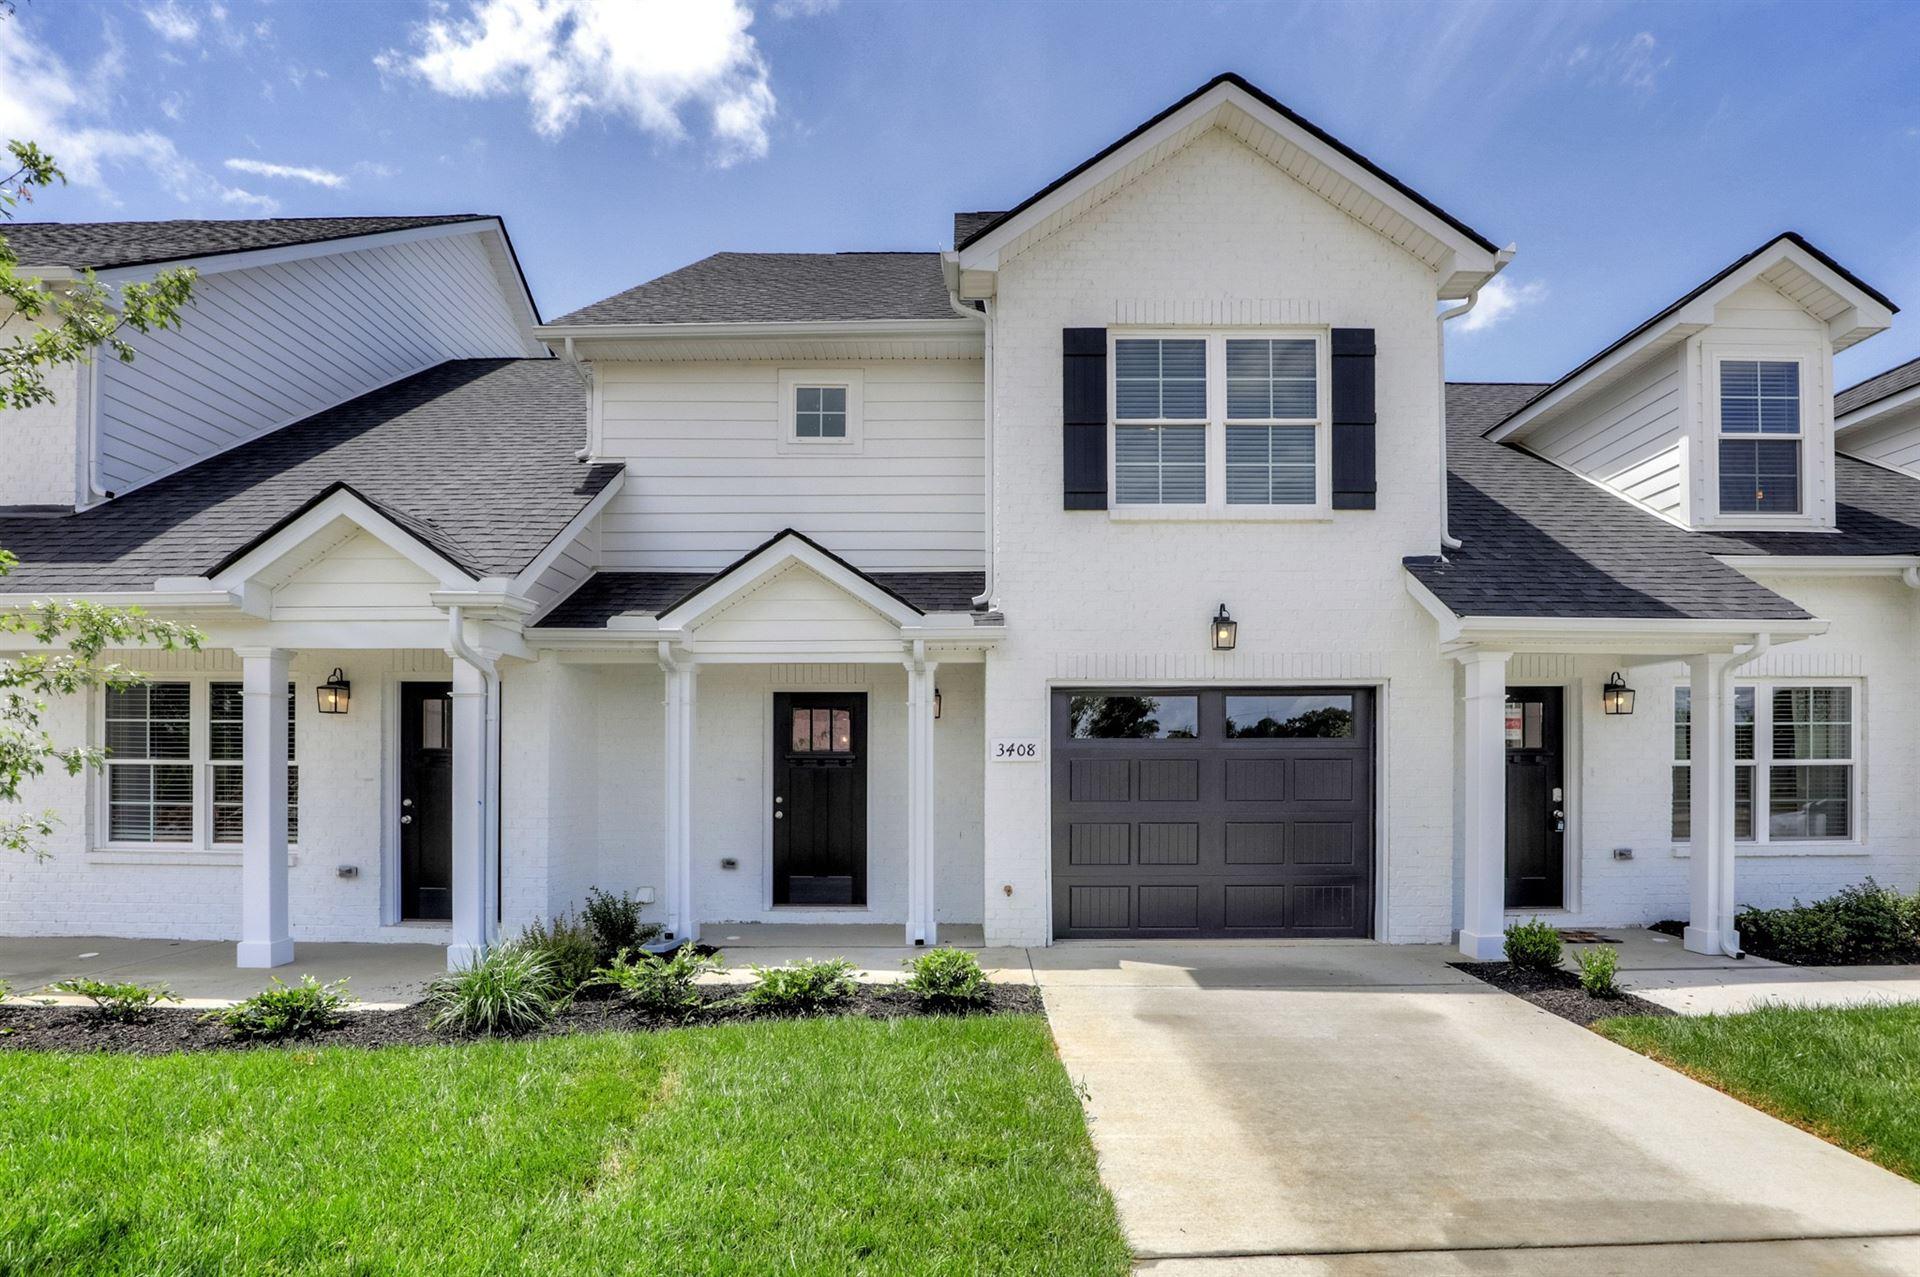 3214 Clemons Cir, Murfreesboro, TN 37128 - MLS#: 2210754